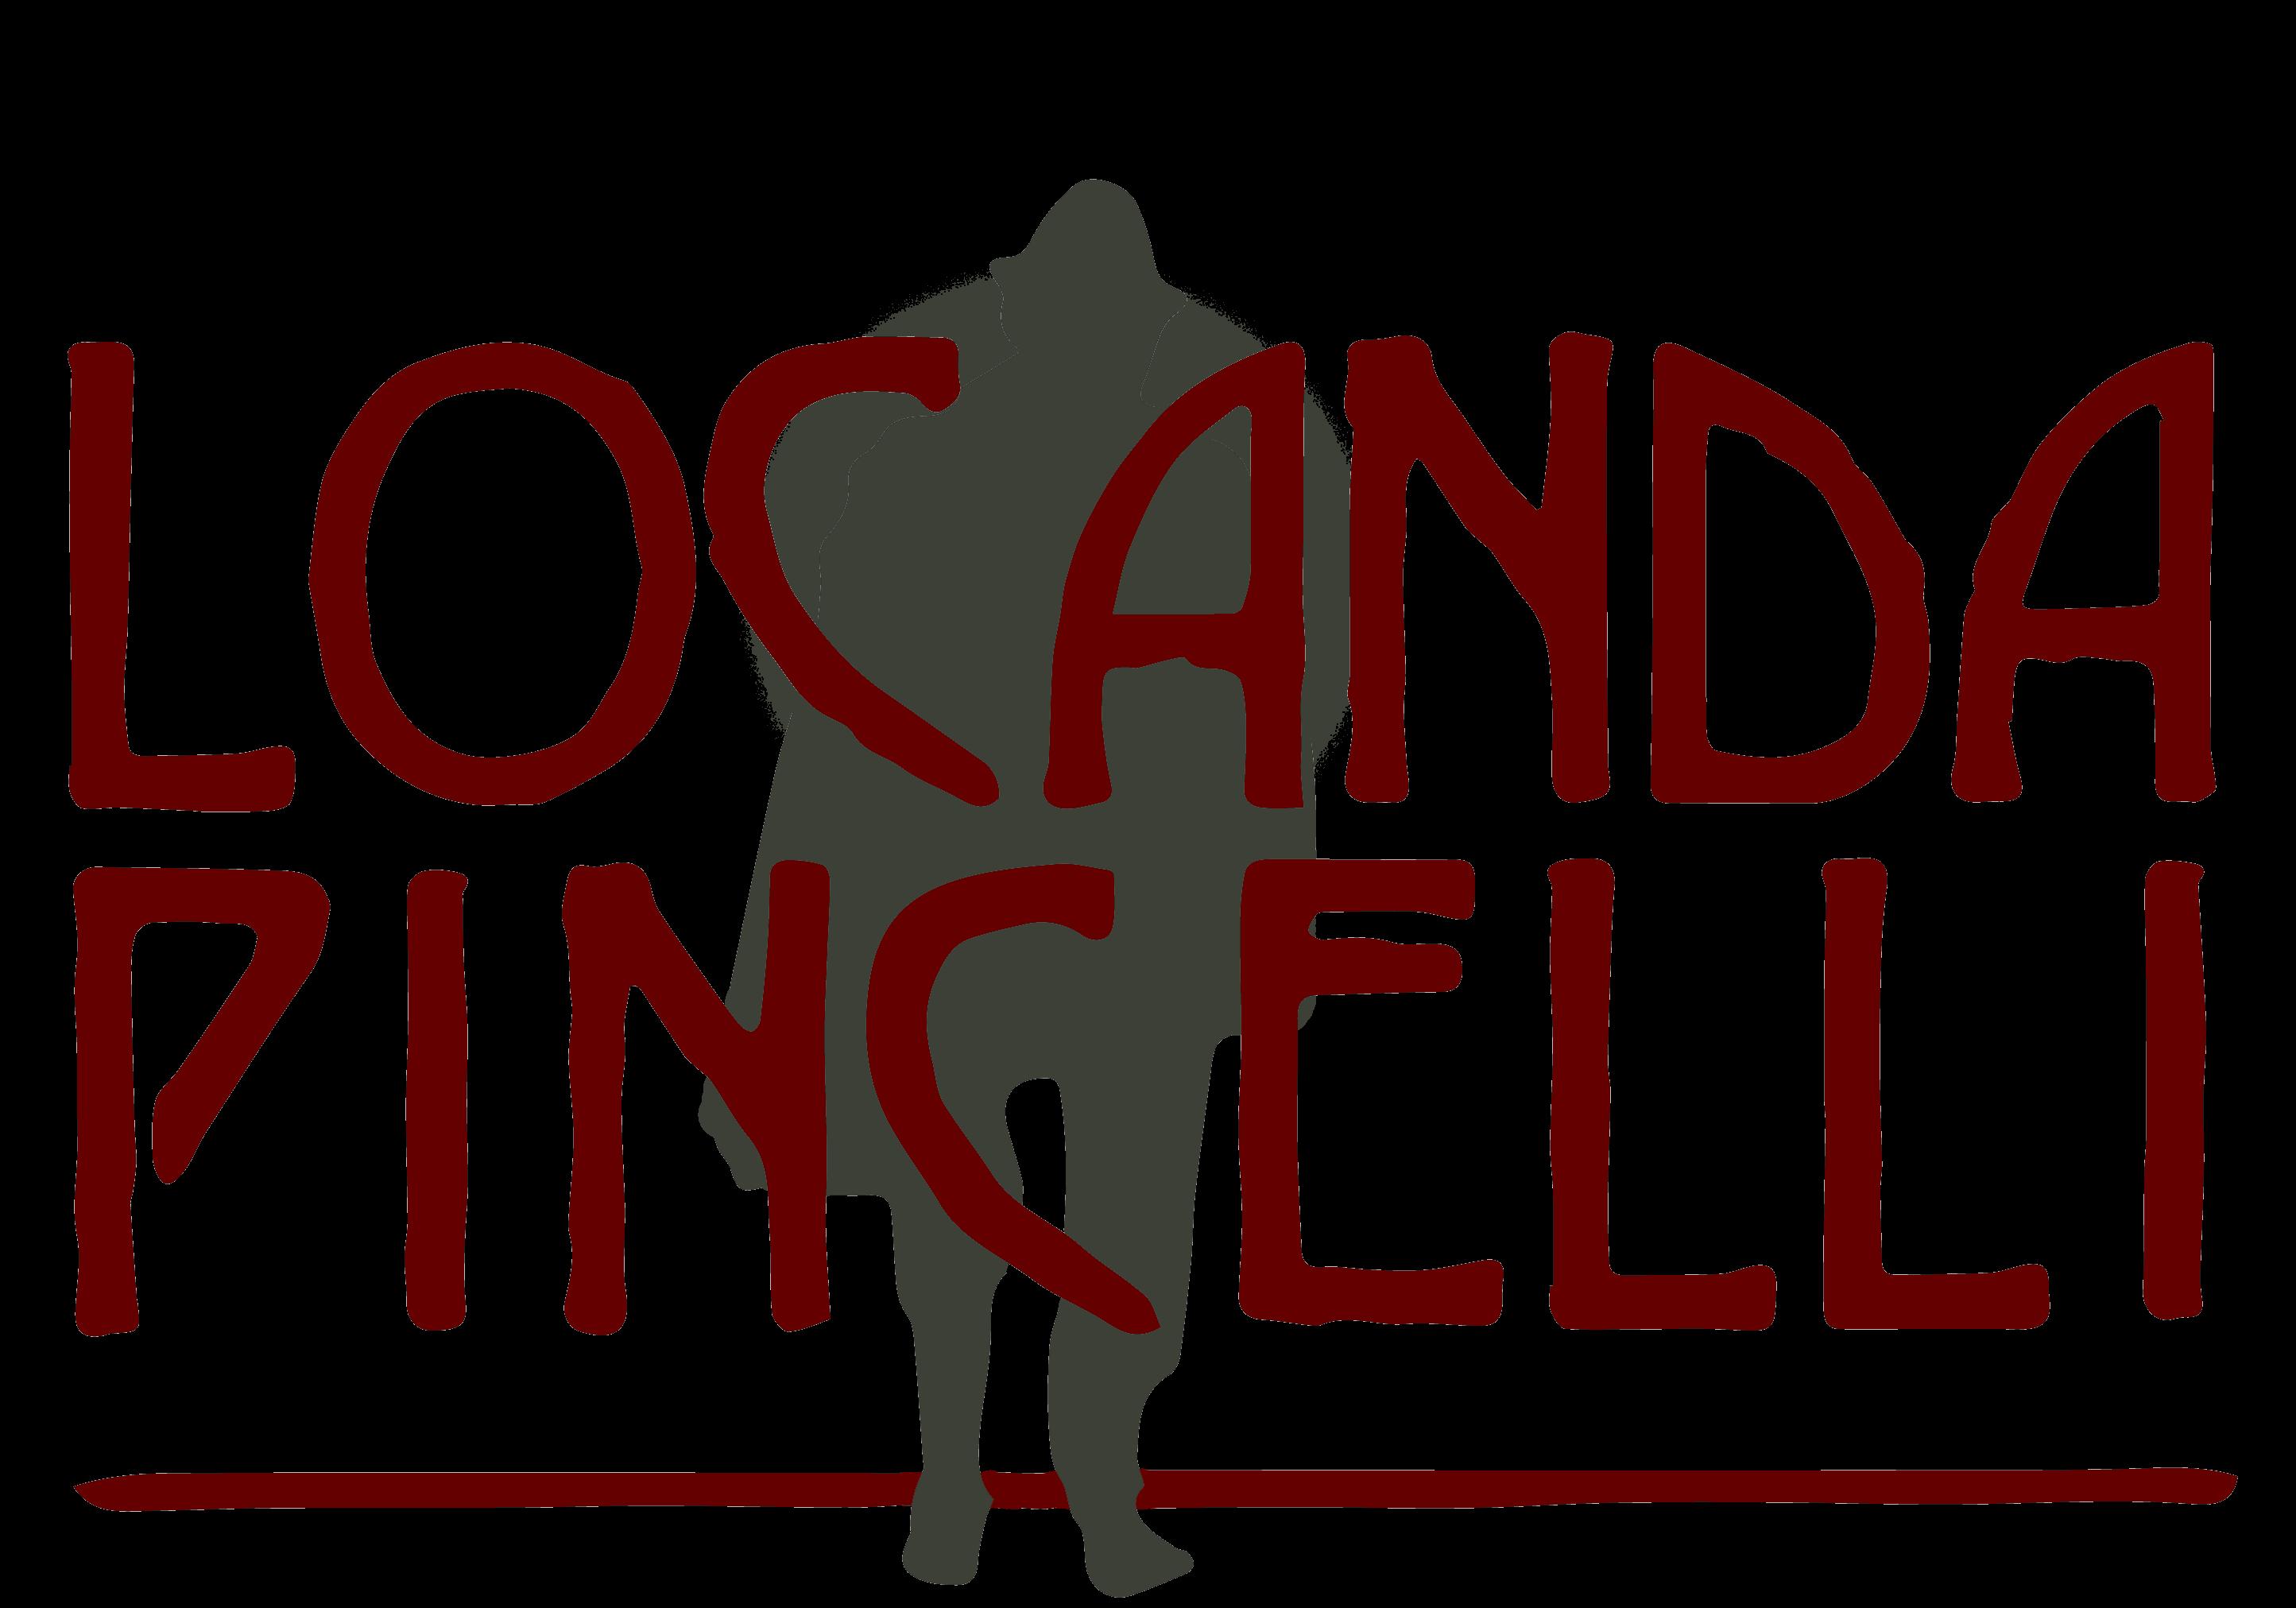 Locanda Pincelli